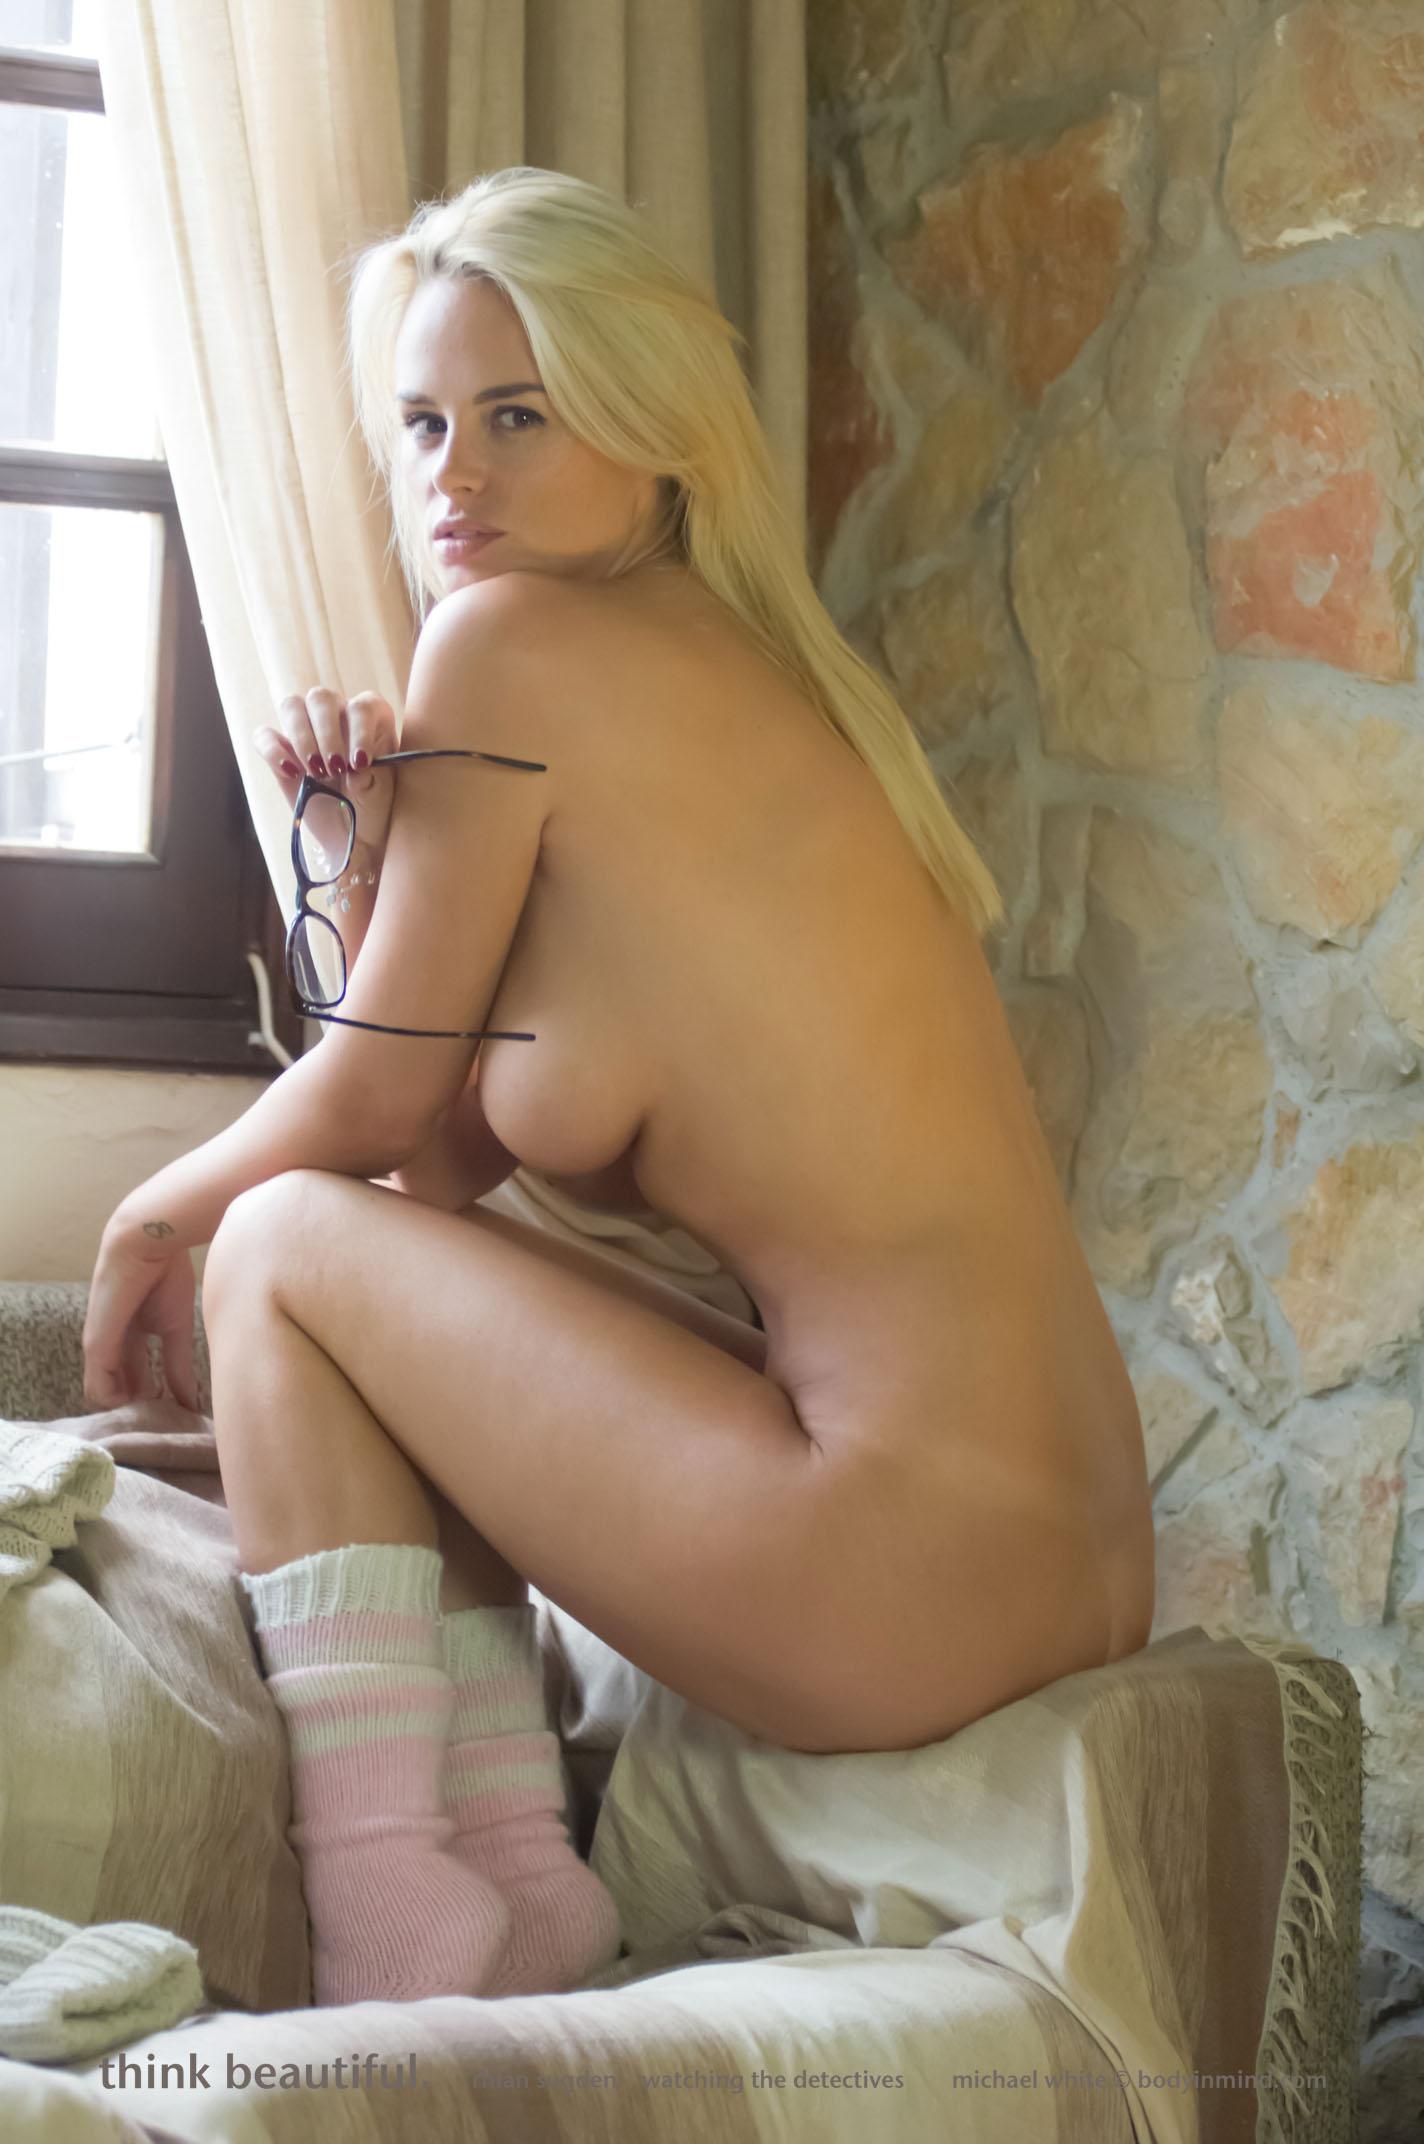 pictures wimen nude Sexual of